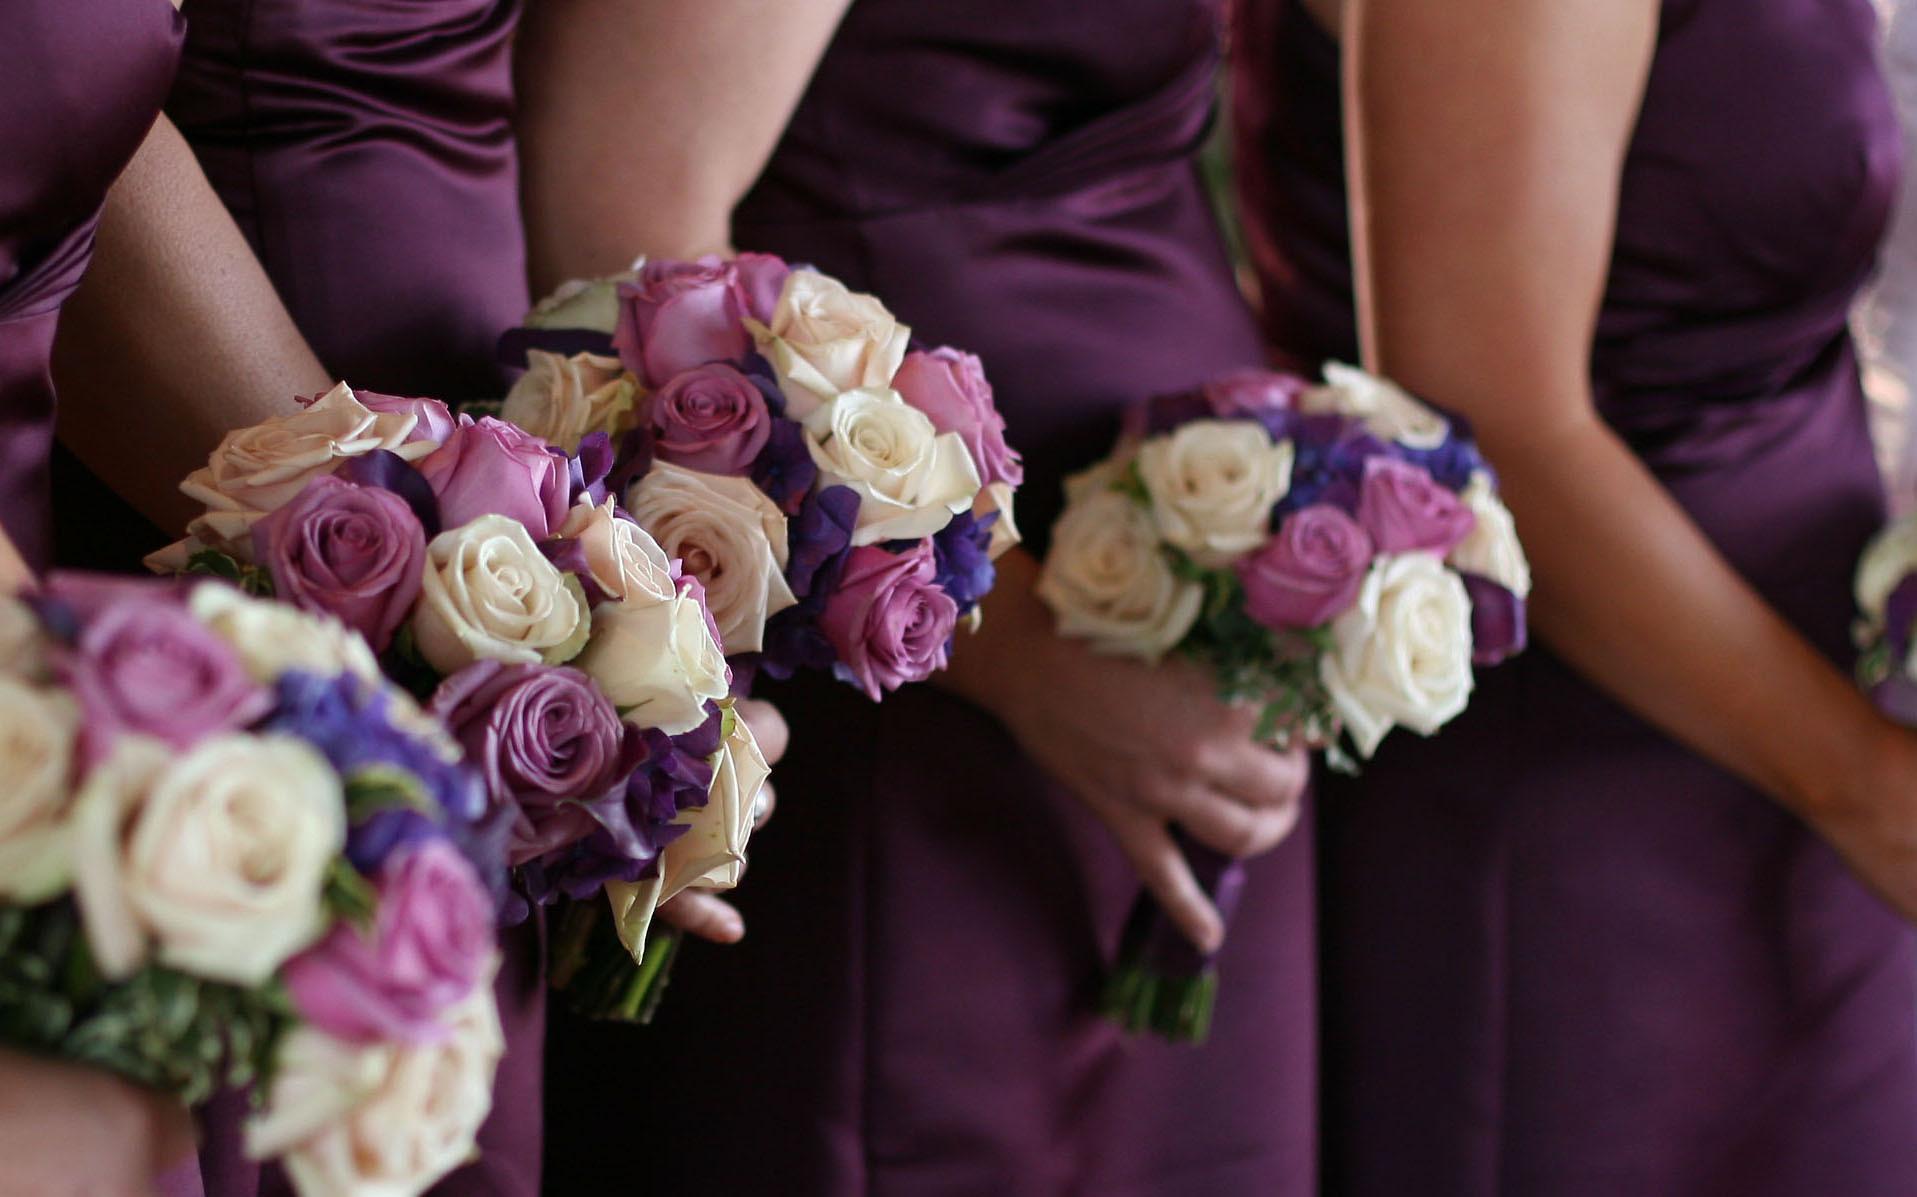 Ceremony, Flowers & Decor, Bridesmaids, Bridesmaids Dresses, Fashion, purple, Ceremony Flowers, Bridesmaid Bouquets, Flowers, Perfect planning events, Flower Wedding Dresses